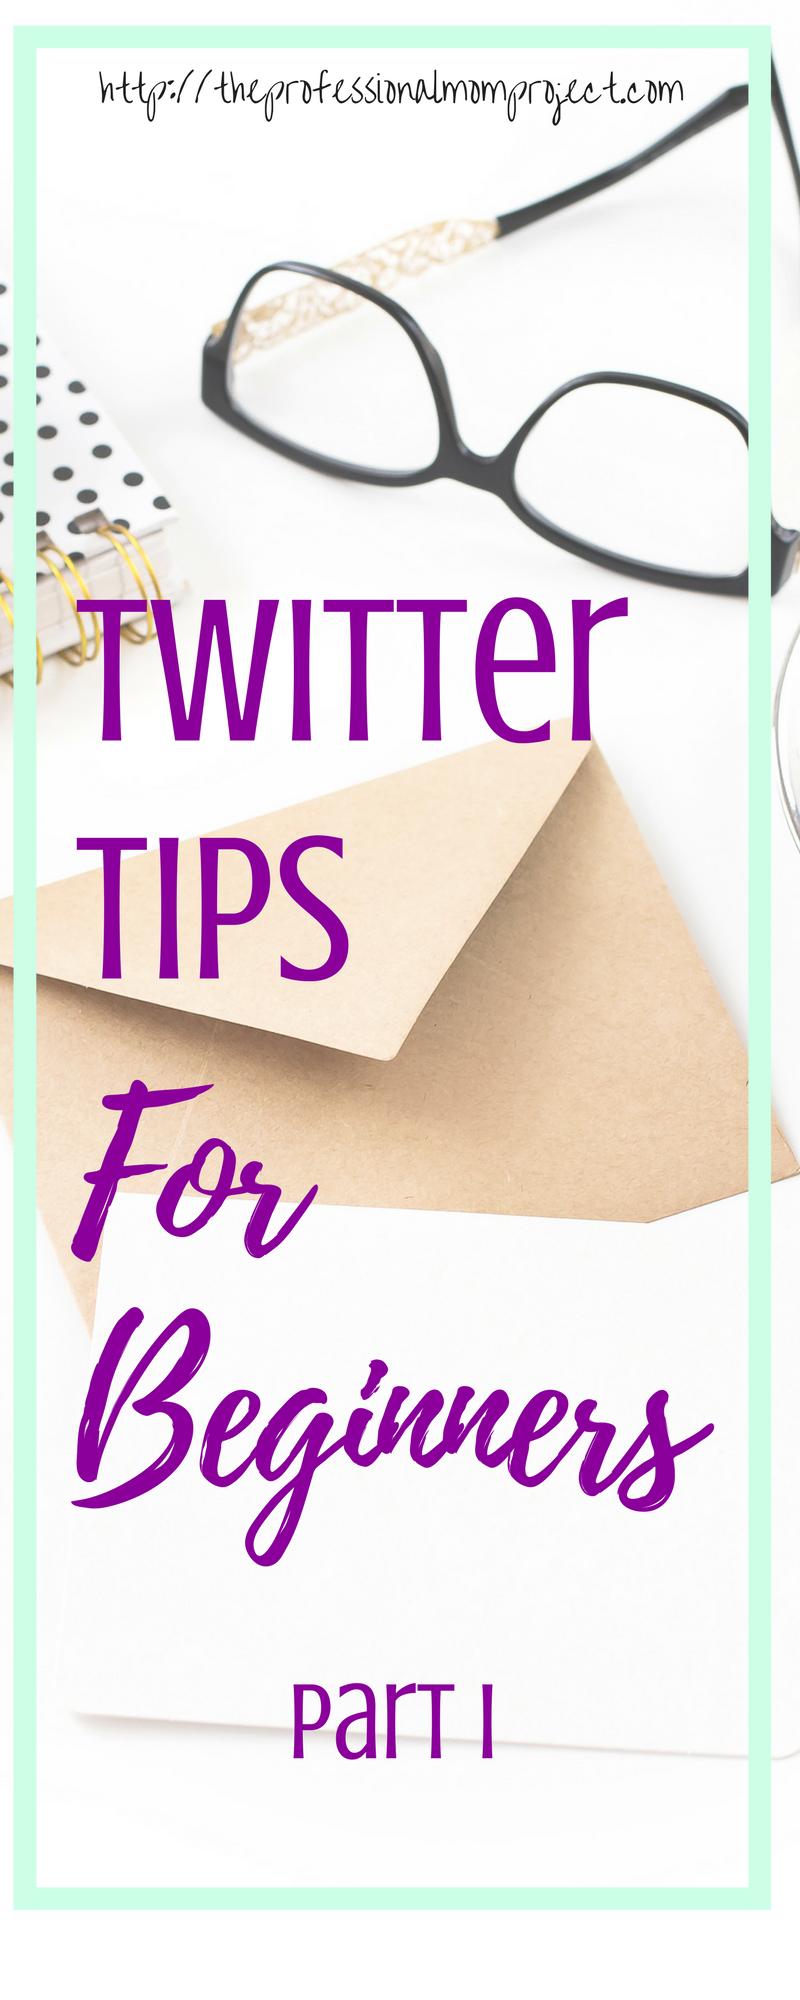 100 Social Media Twitter Tips Ideas Twitter Tips Social Media Twitter Marketing